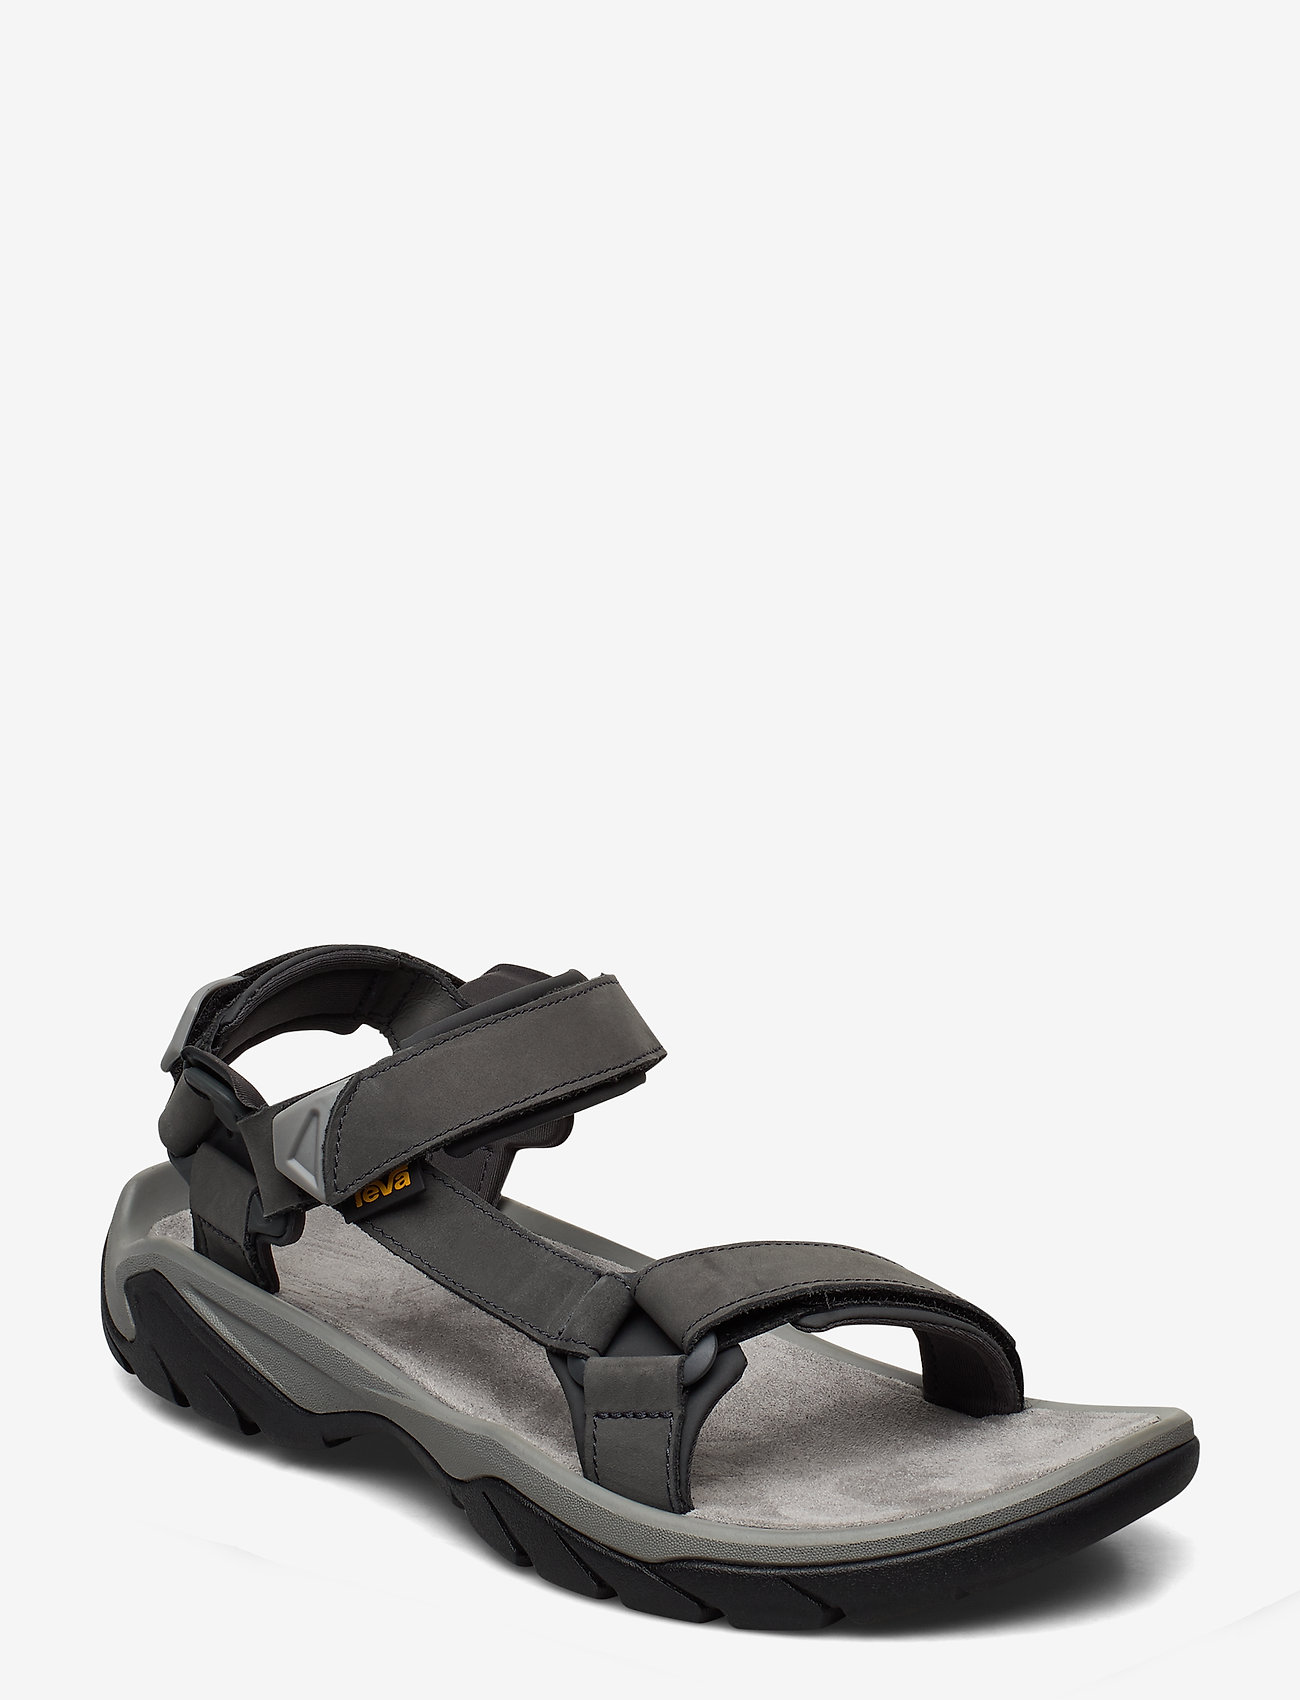 M Terra Fi 5 Universal Leather (Dark Shadow) (91 €) Teva